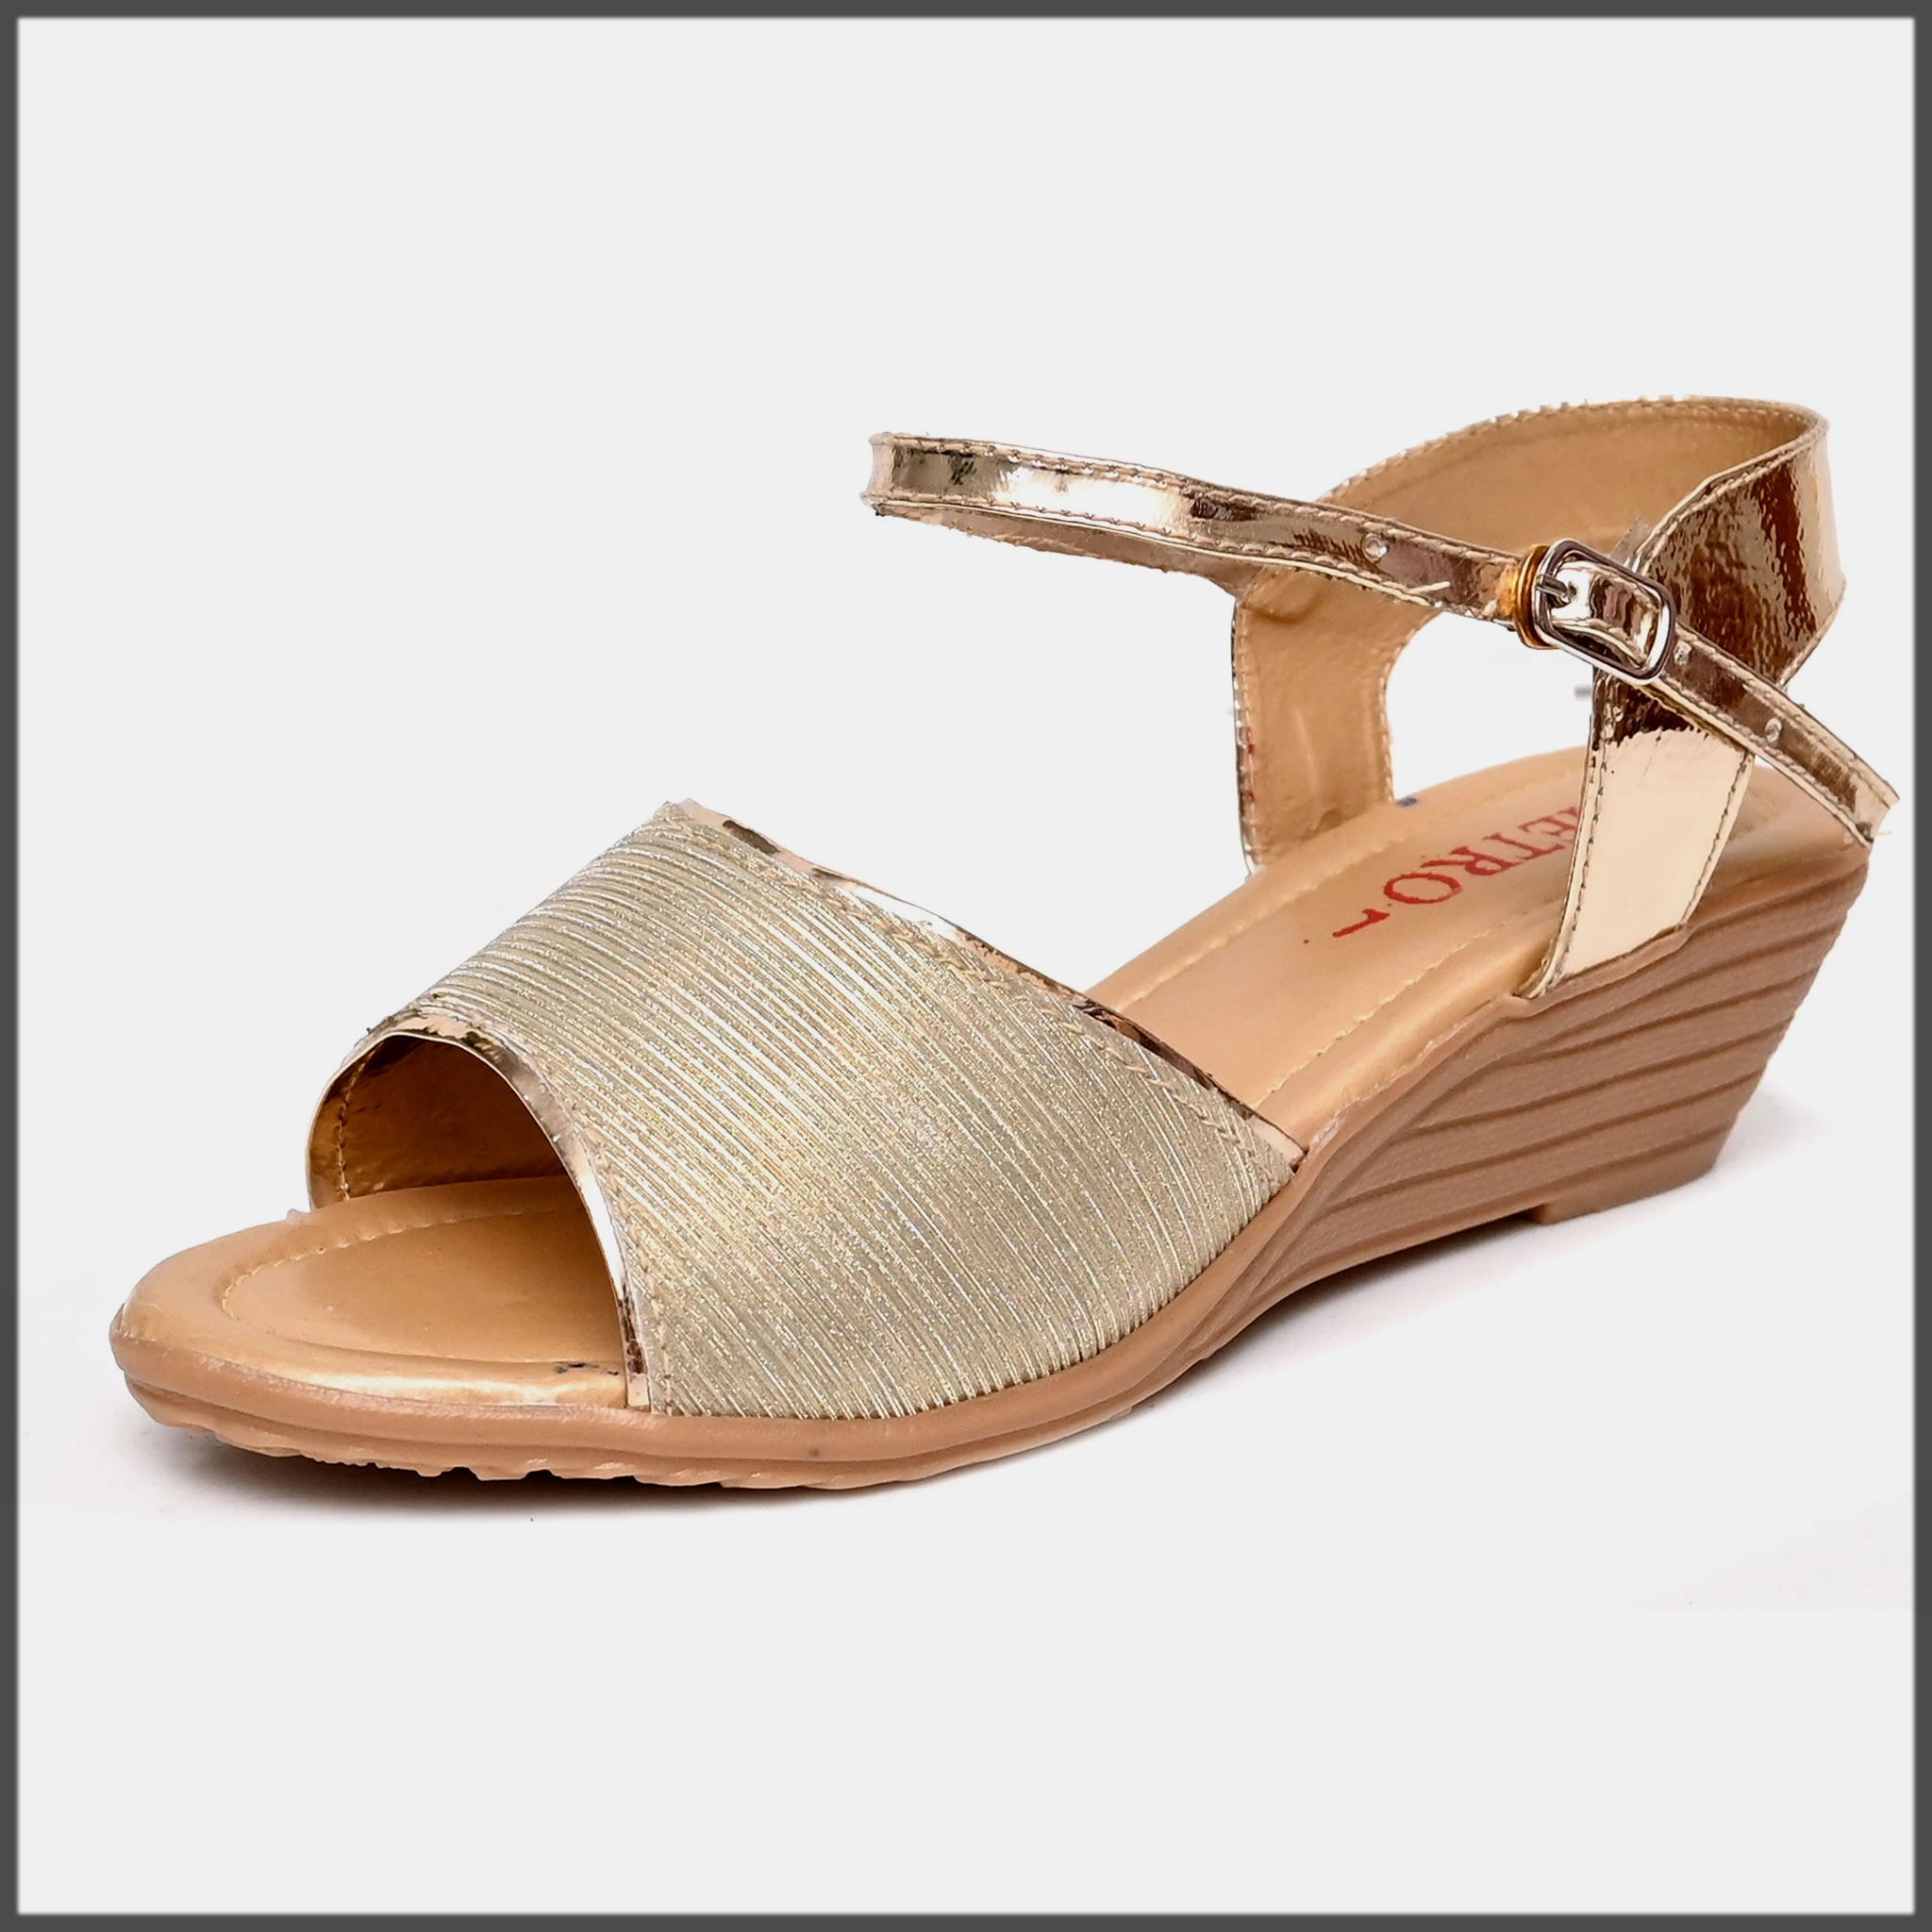 classy summer sandals for women